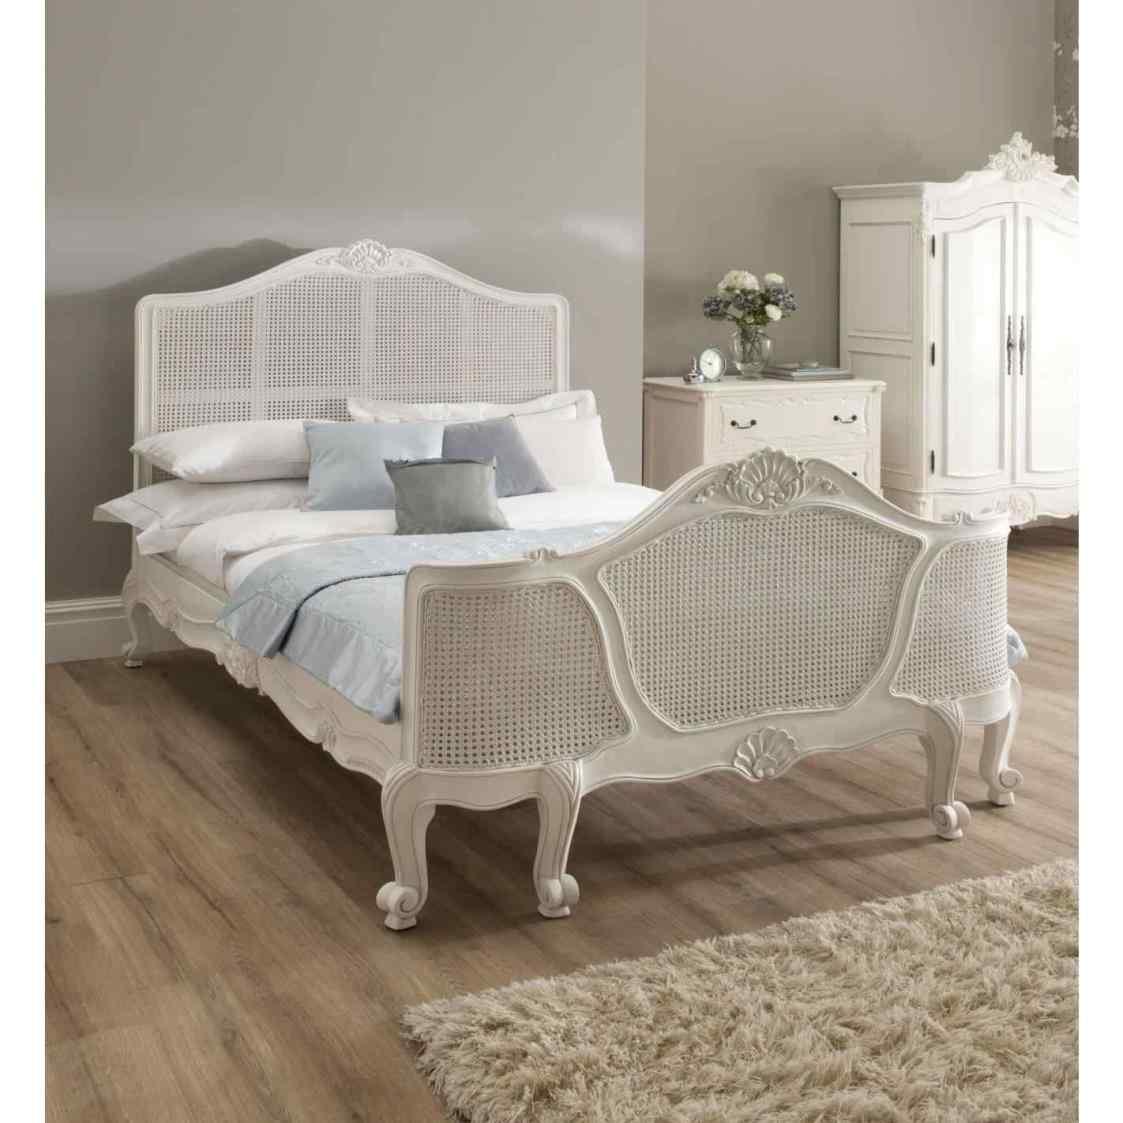 black rattan bedroom furniture photo - 4